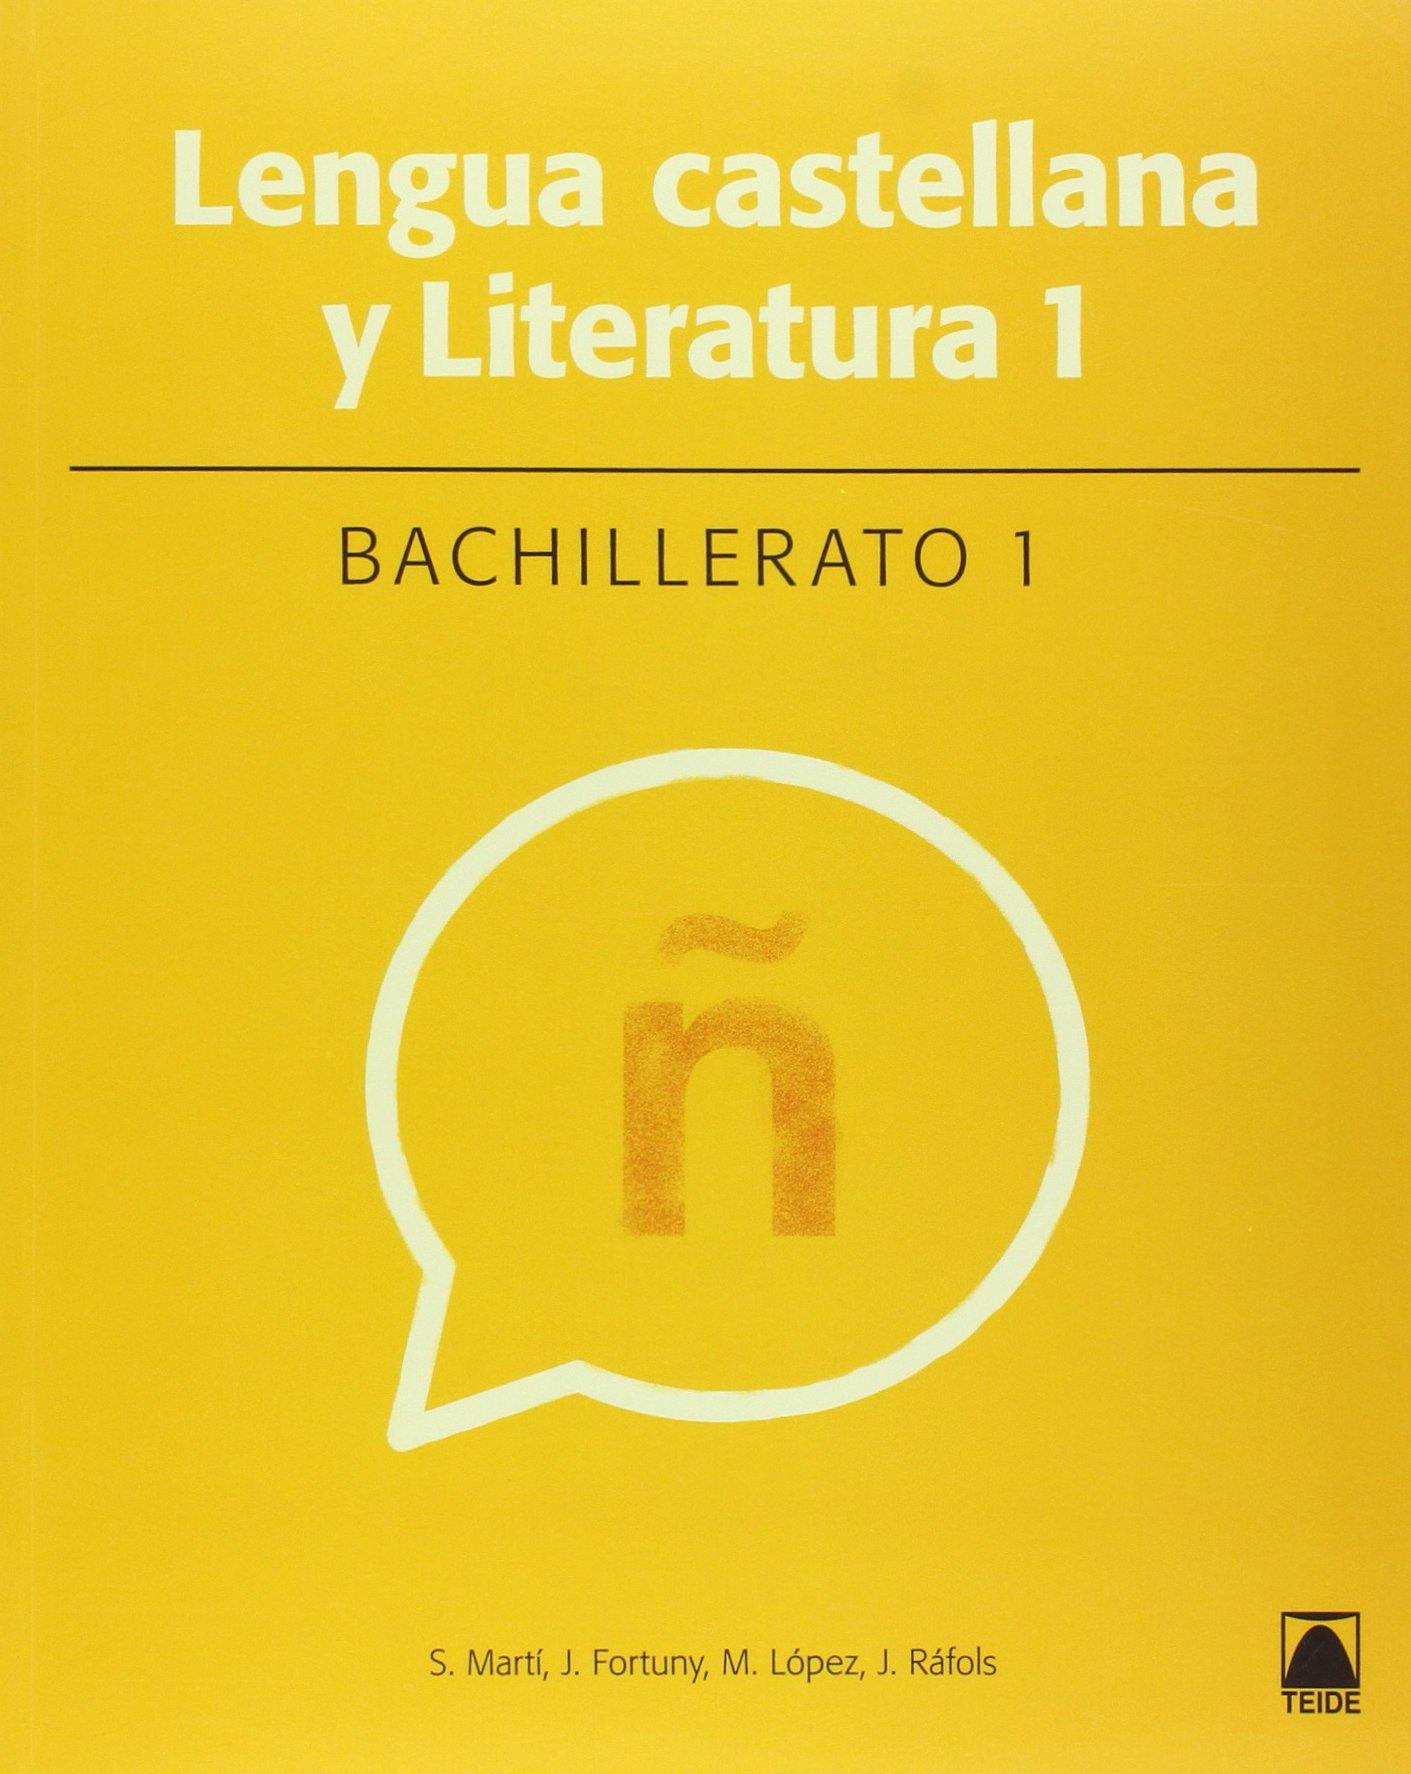 Lengua castellana 1. Bachillerato - 9788430753420: Amazon.es: Fortuny Giné, Joan Baptista, Martí Raüll, Salvador, Ràfols Vives, Joana, López Robles, Marta: Libros